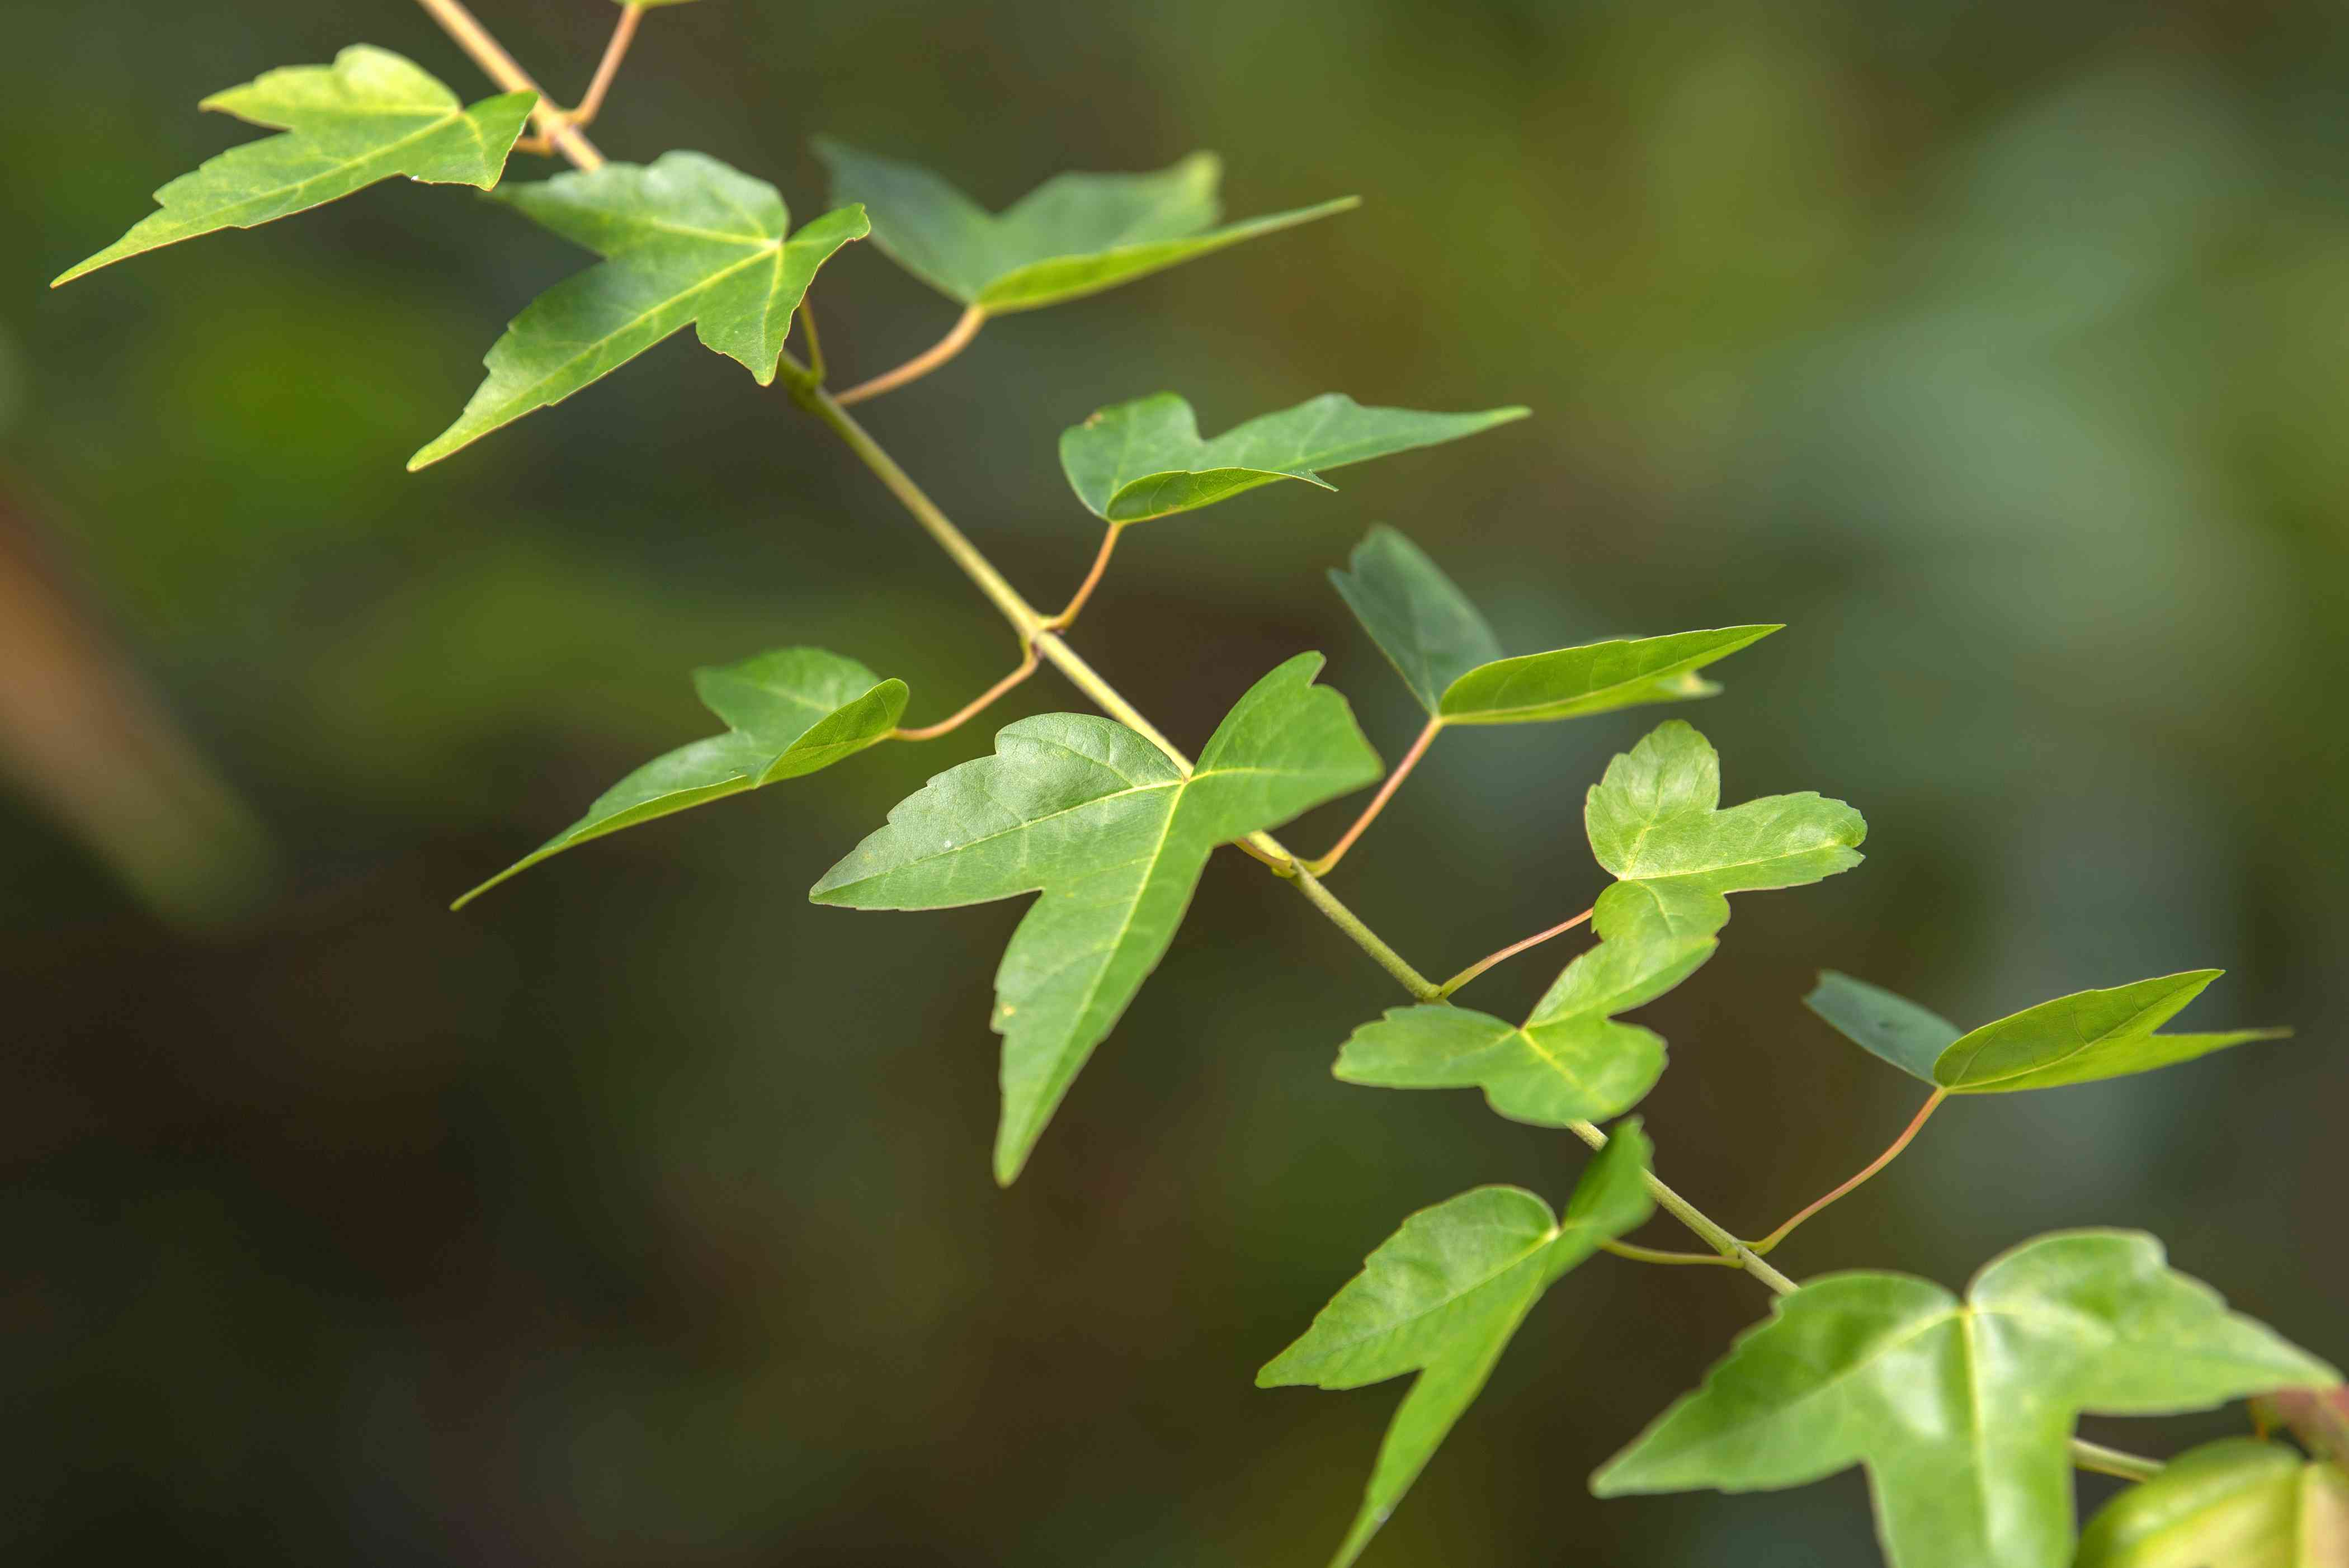 Trident maple tree with three-lobed leaves on stem closeup